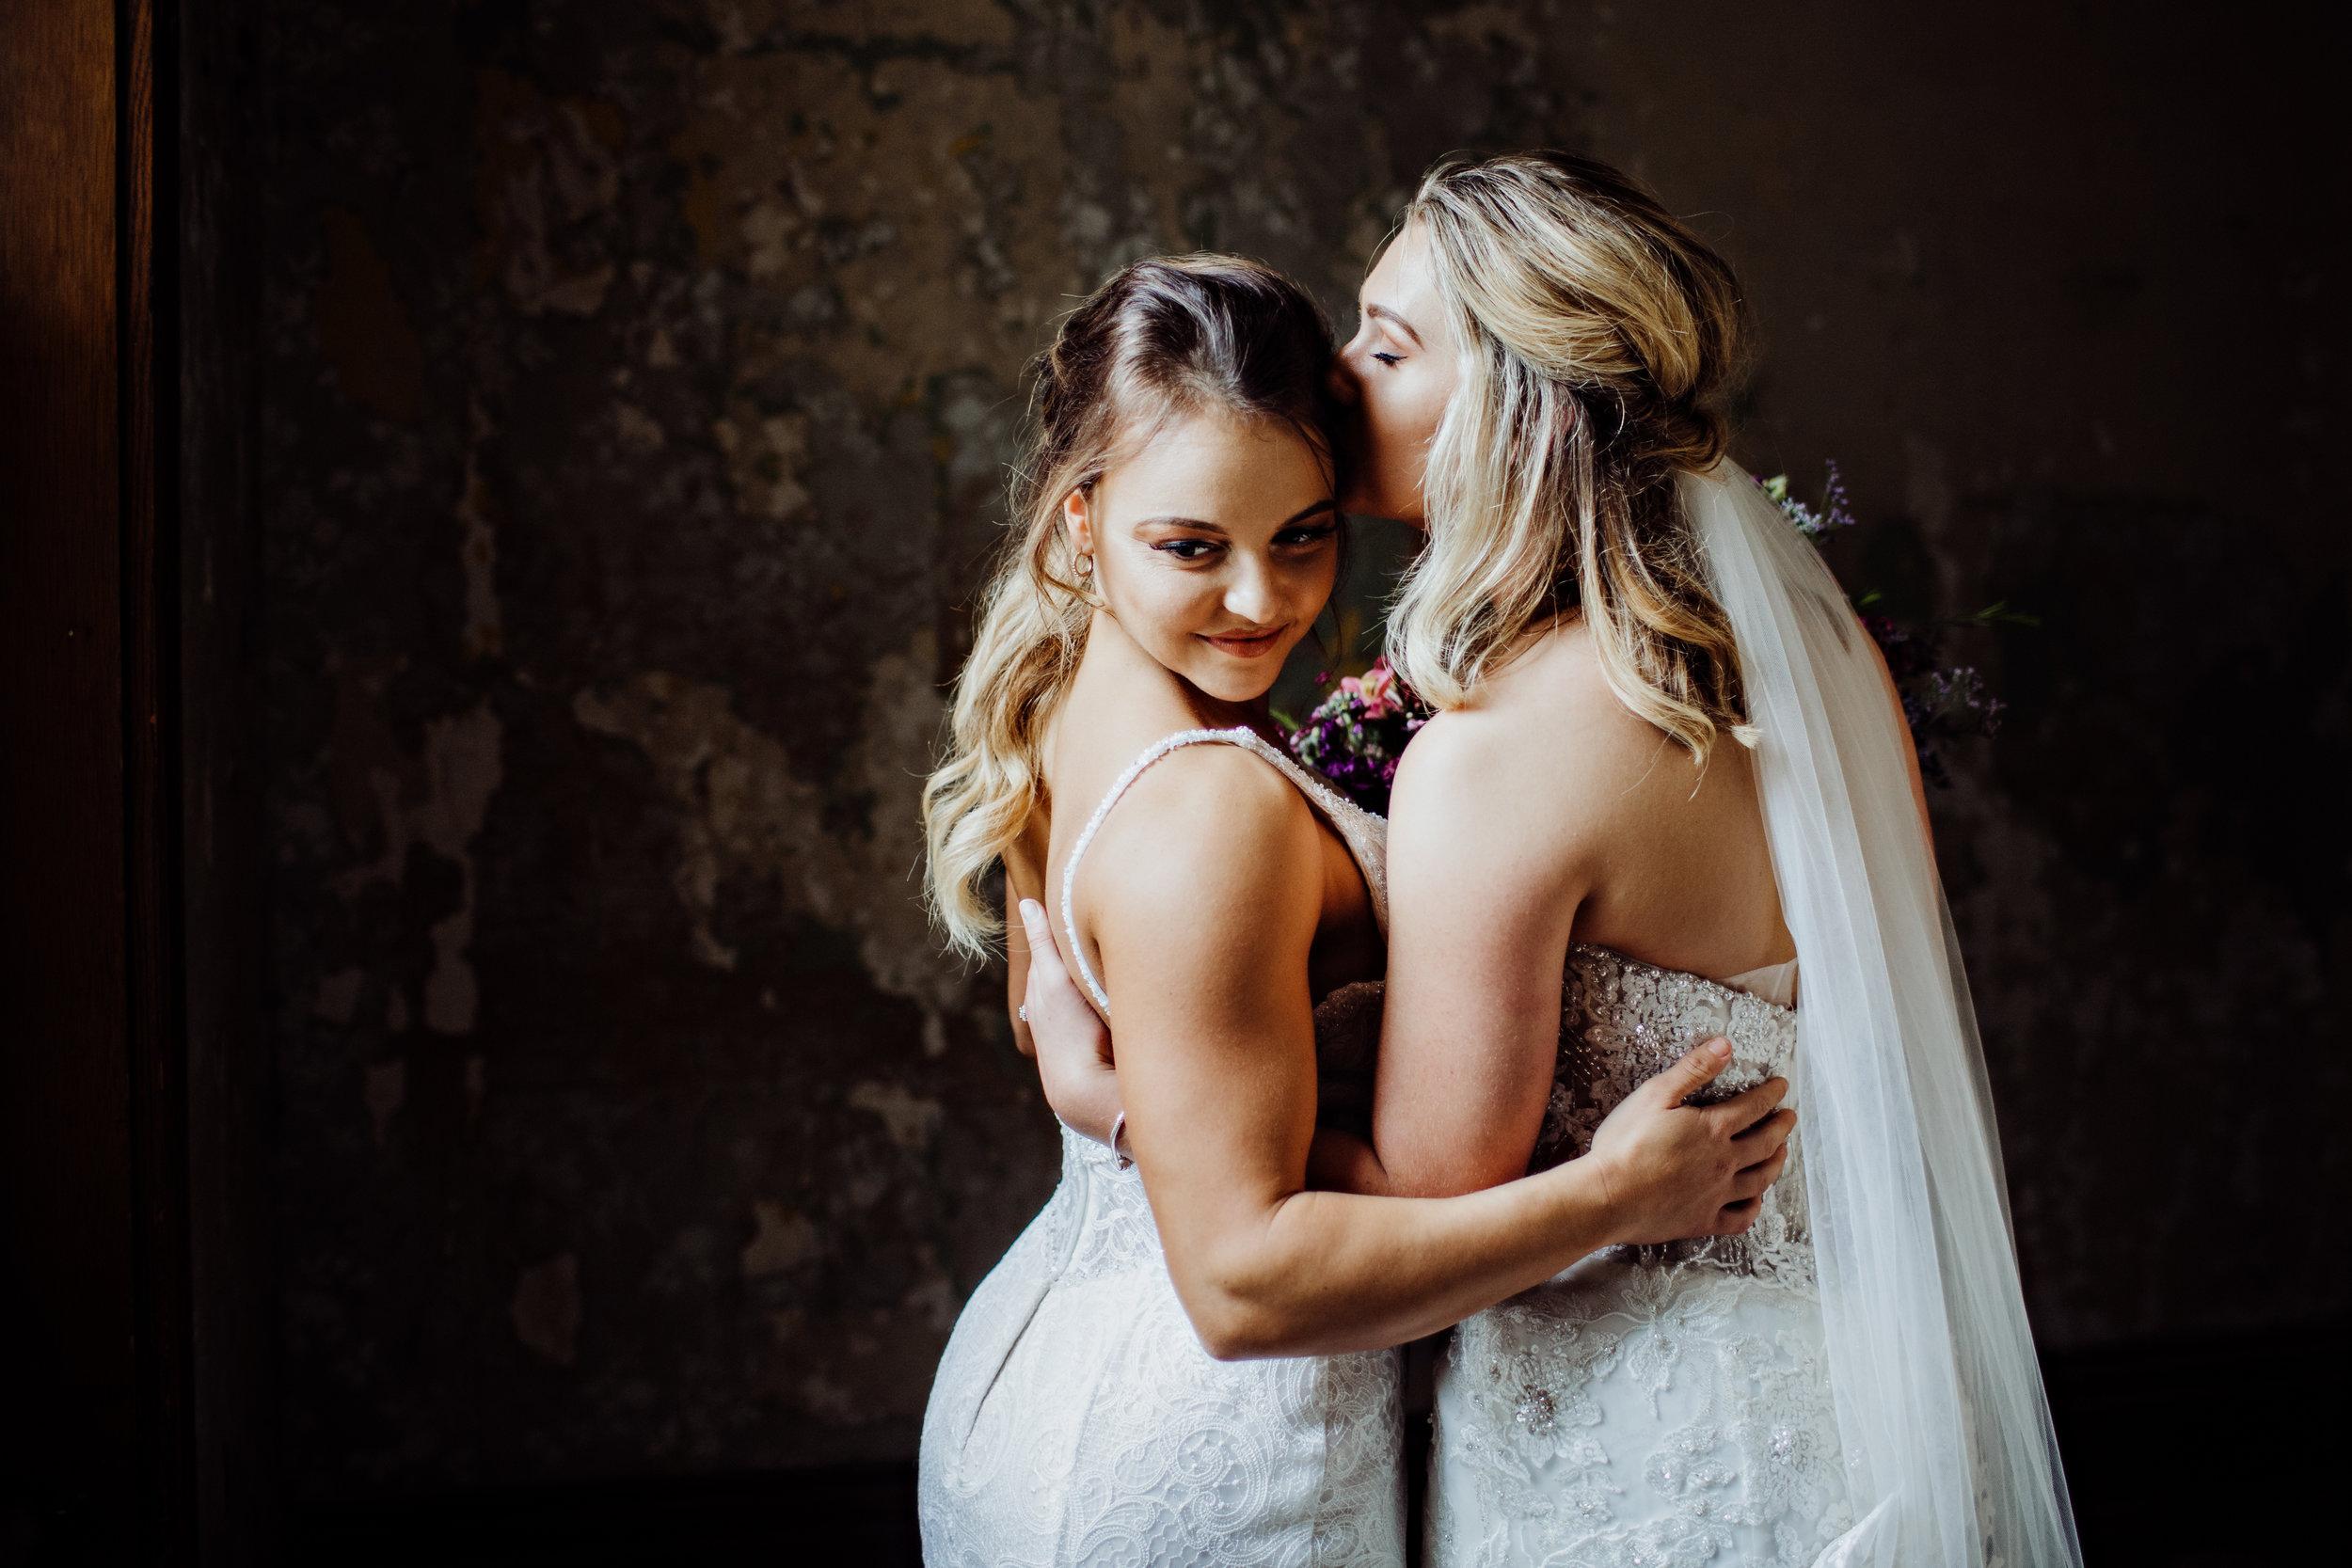 Lesbian wedding styled shoot at ohio state reformatory. wedding gowns. cincinnati wedding planner traveled to columbus.